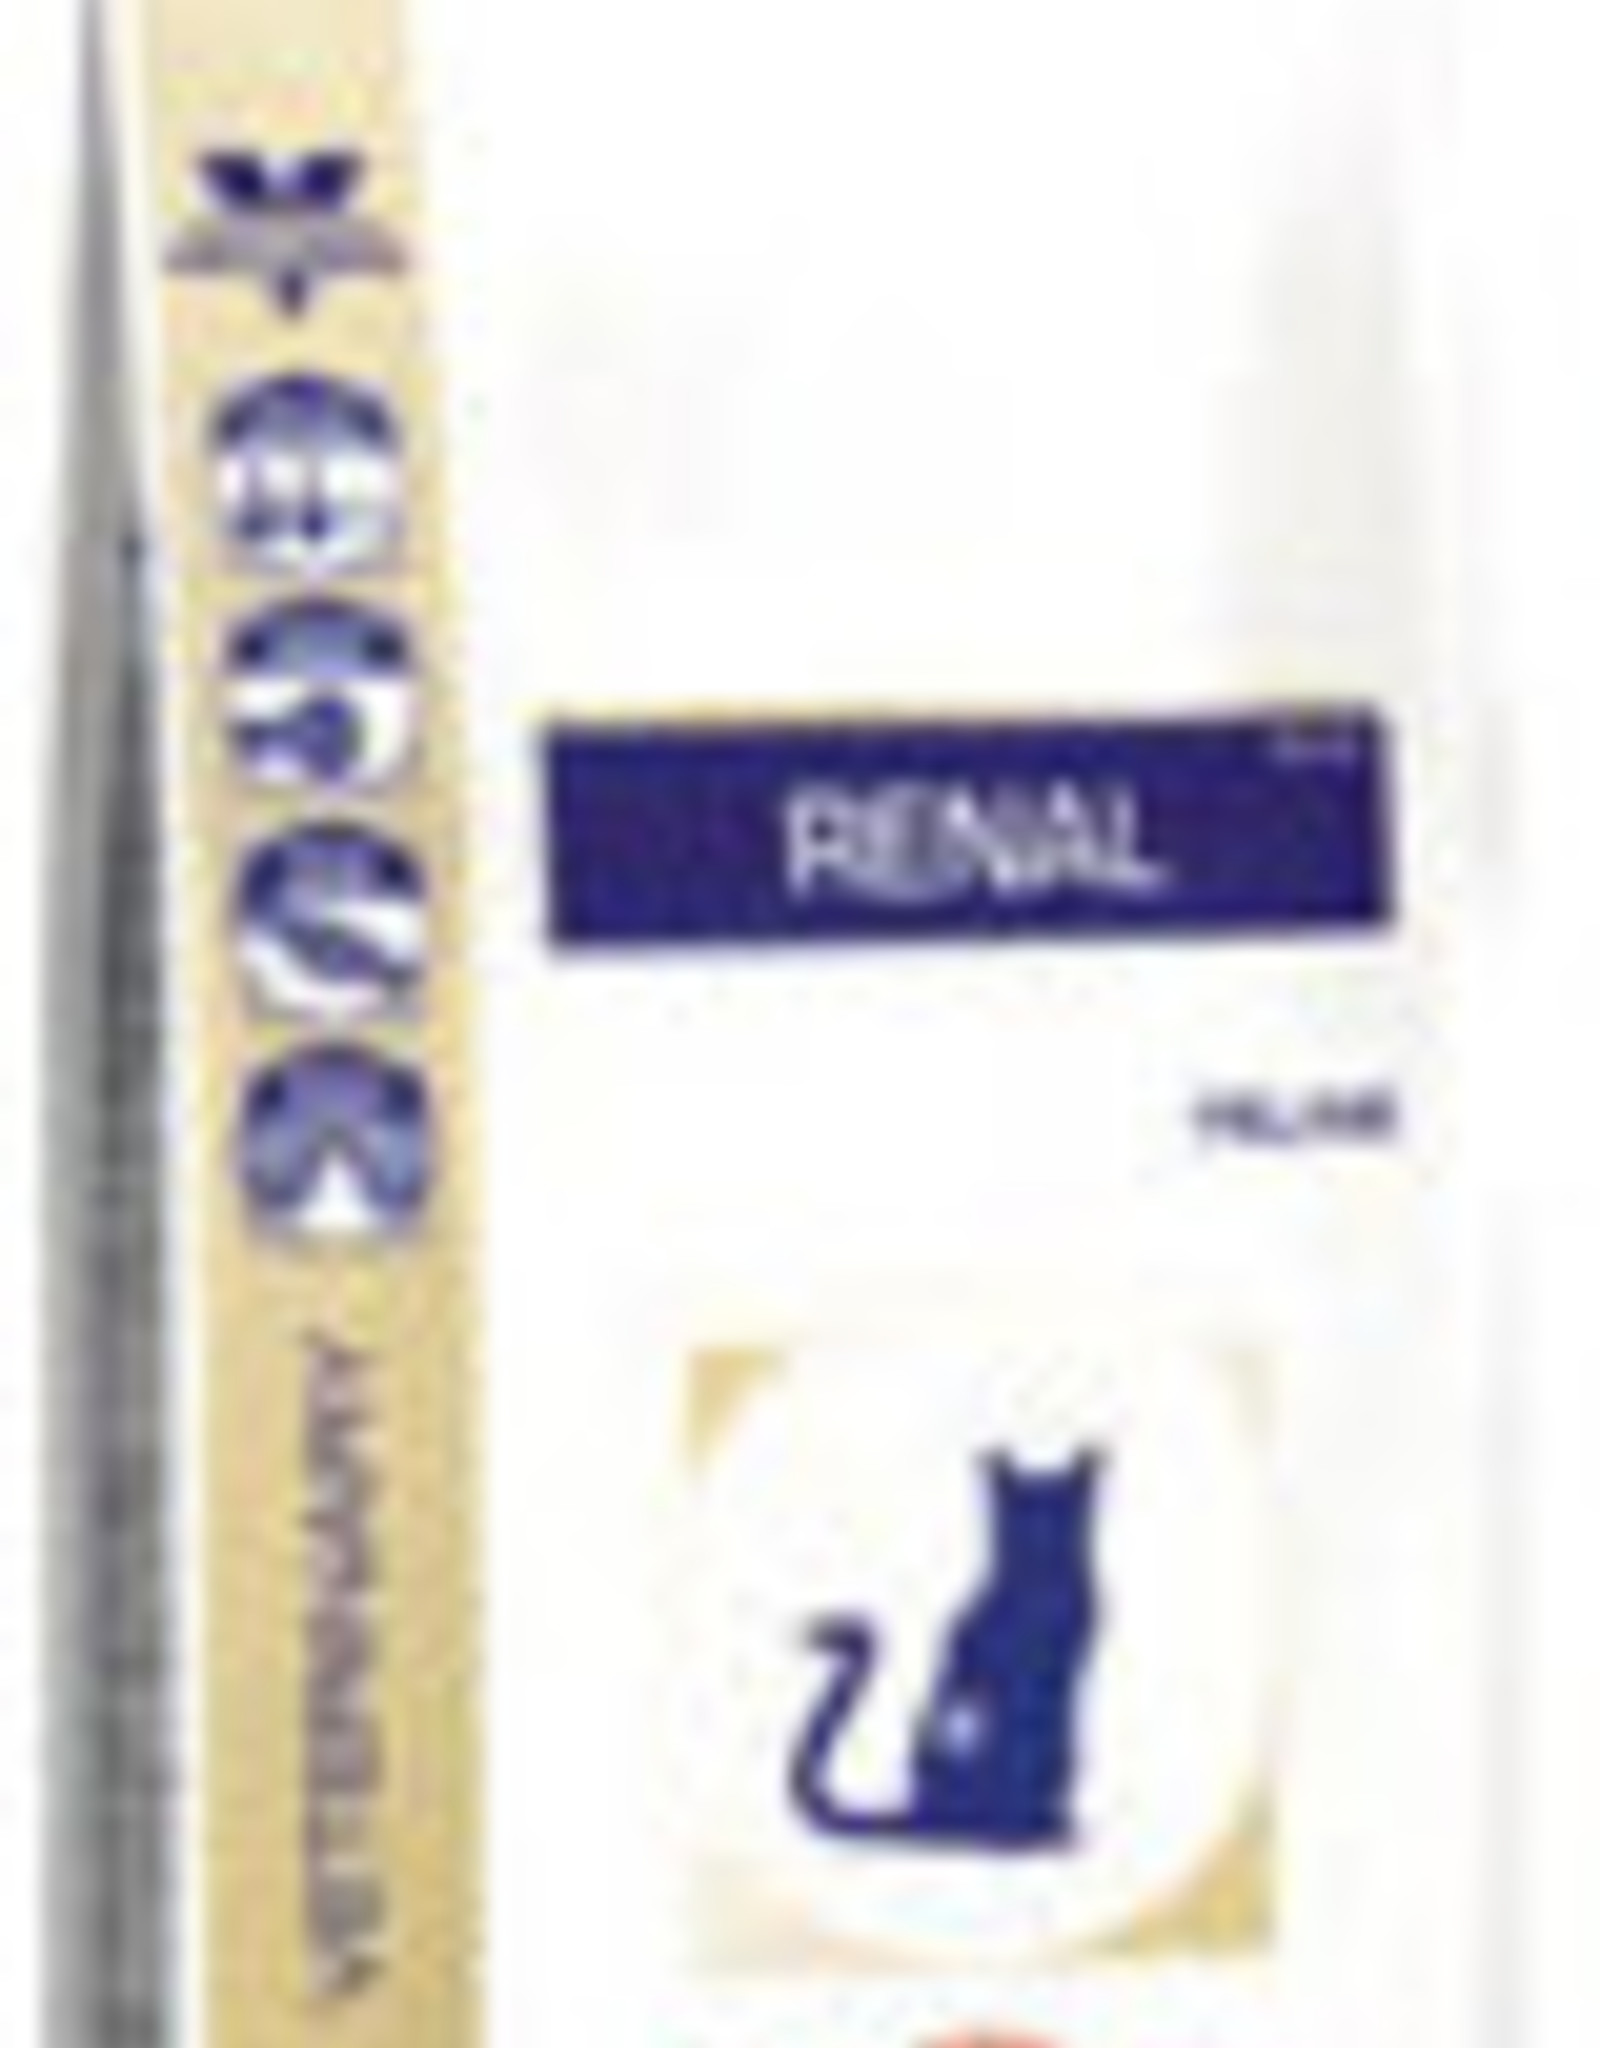 Royal Canin Royal Canin Vdiet Renal Katze 400gr